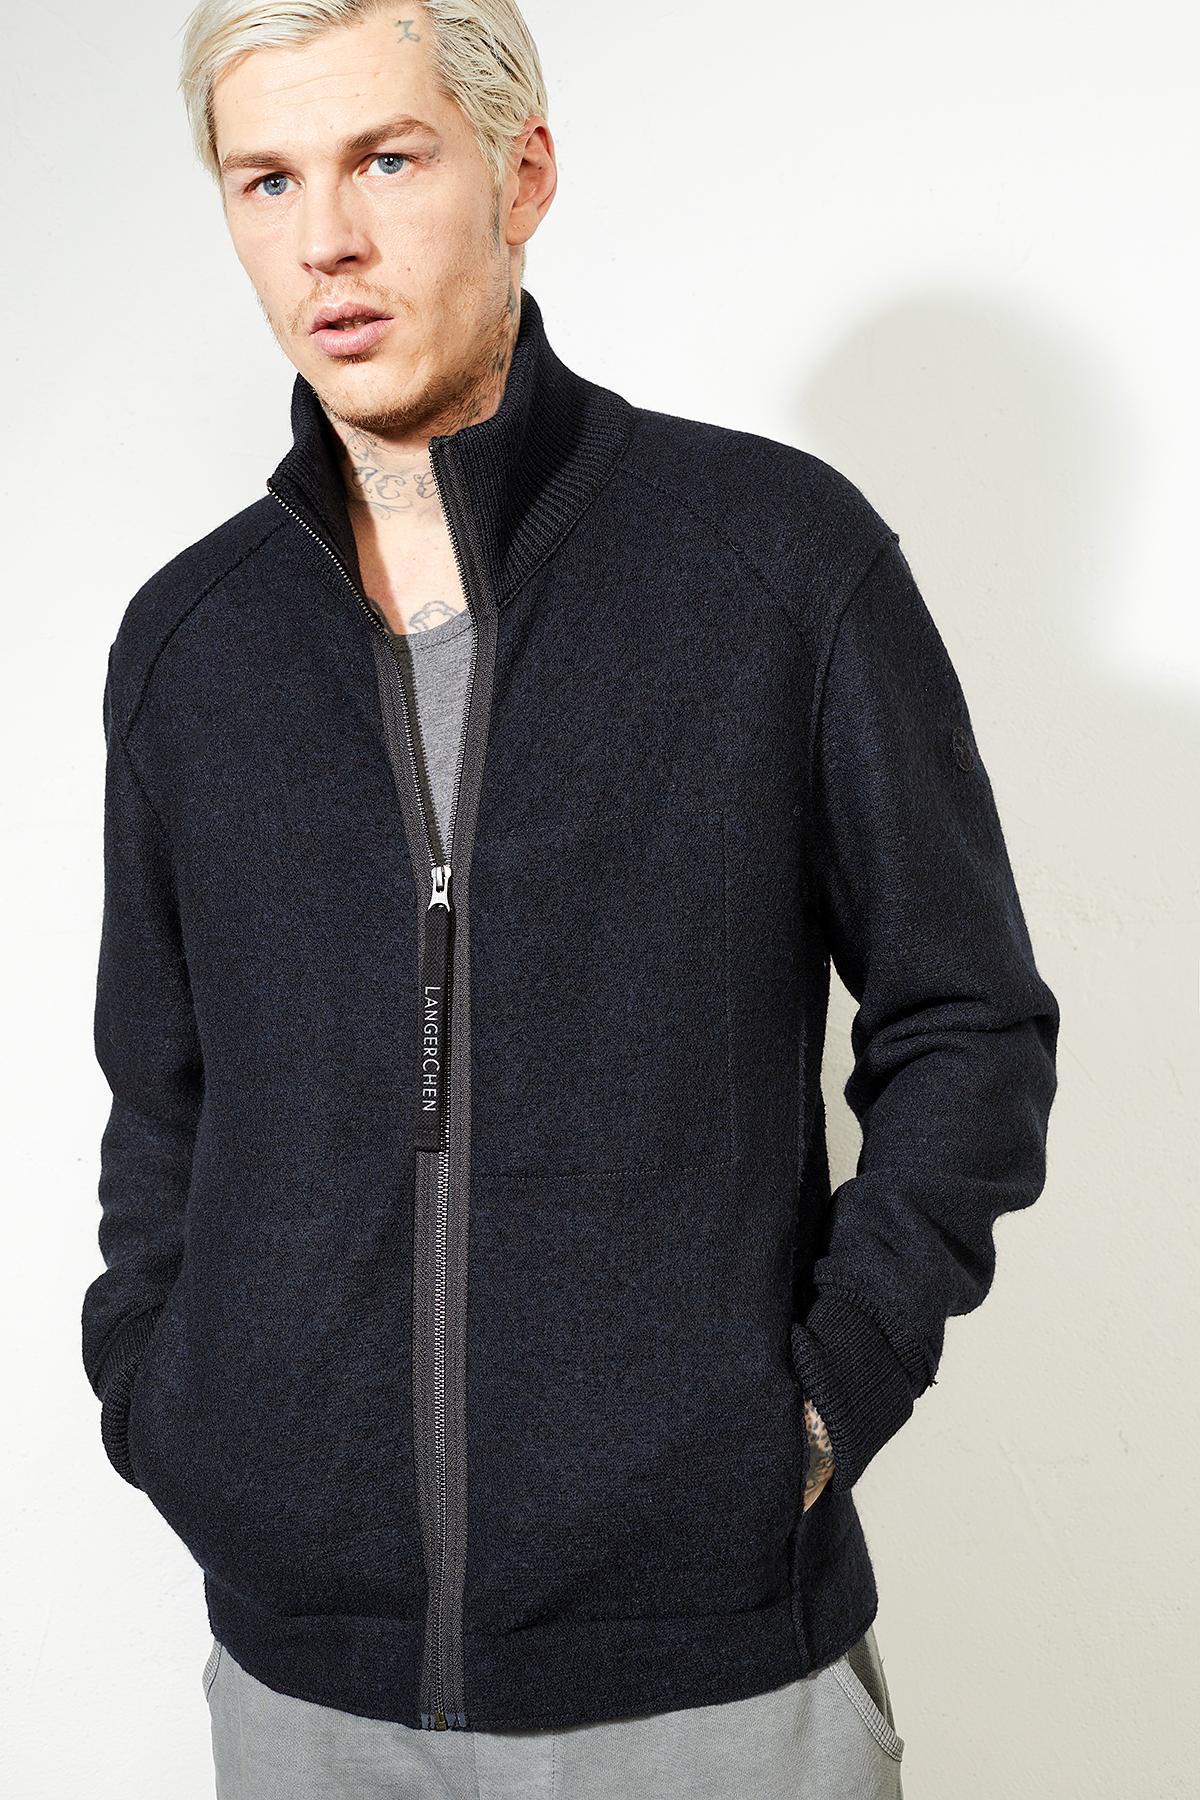 Herren-Jacke aus Wolle Linwood carbon